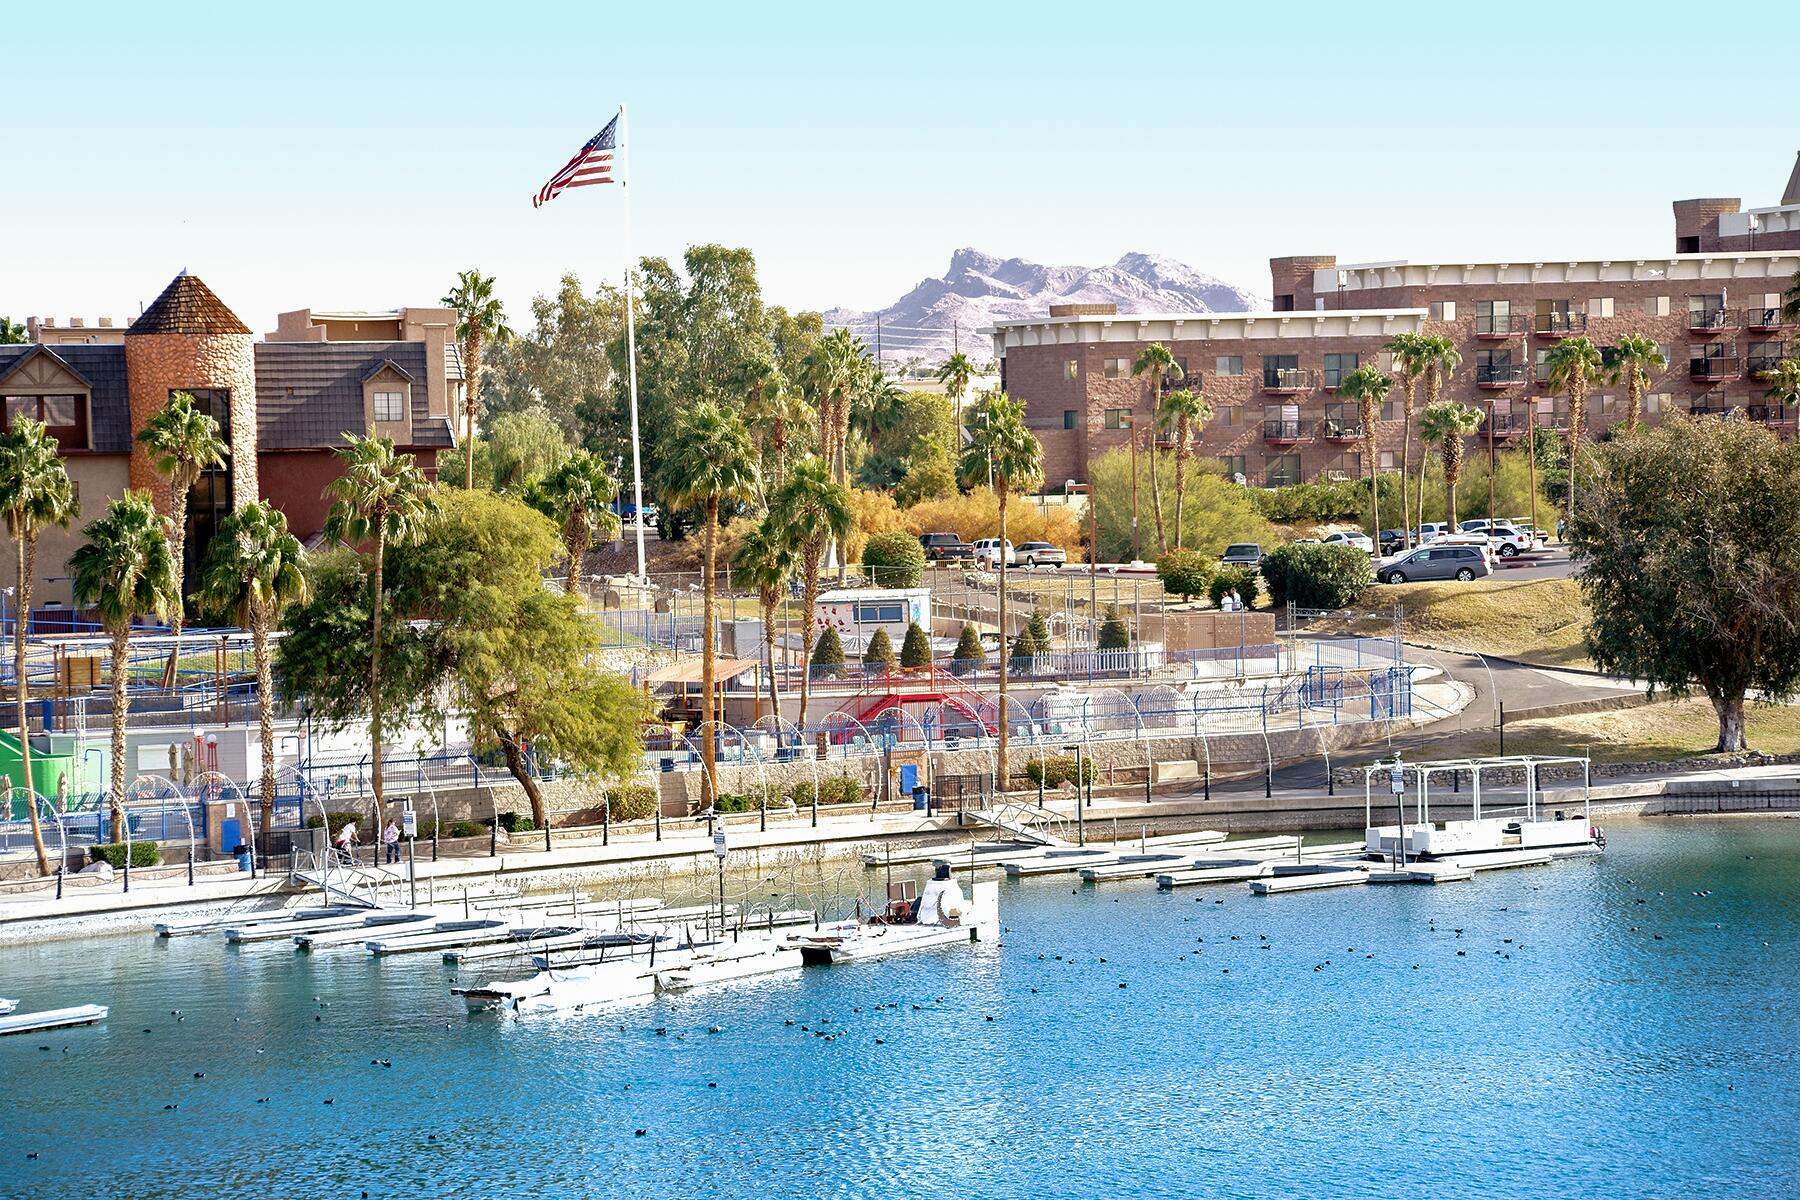 Los Angeles to Lake Havasu City, Arizona